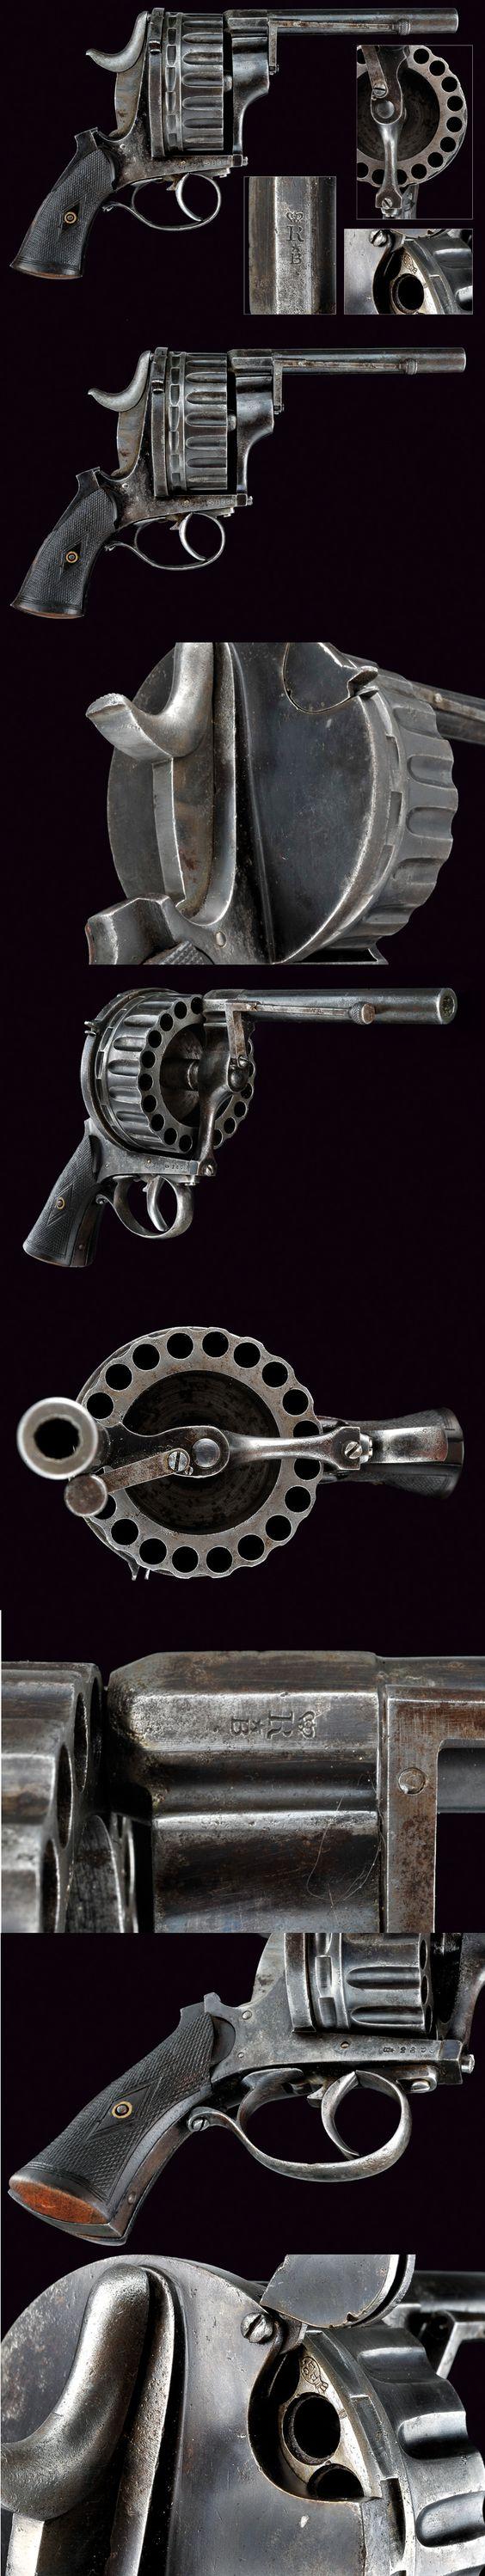 A very scarce twenty-shot centerfire revolver. provenance: Europe dating: third quarter of the 19th Century: